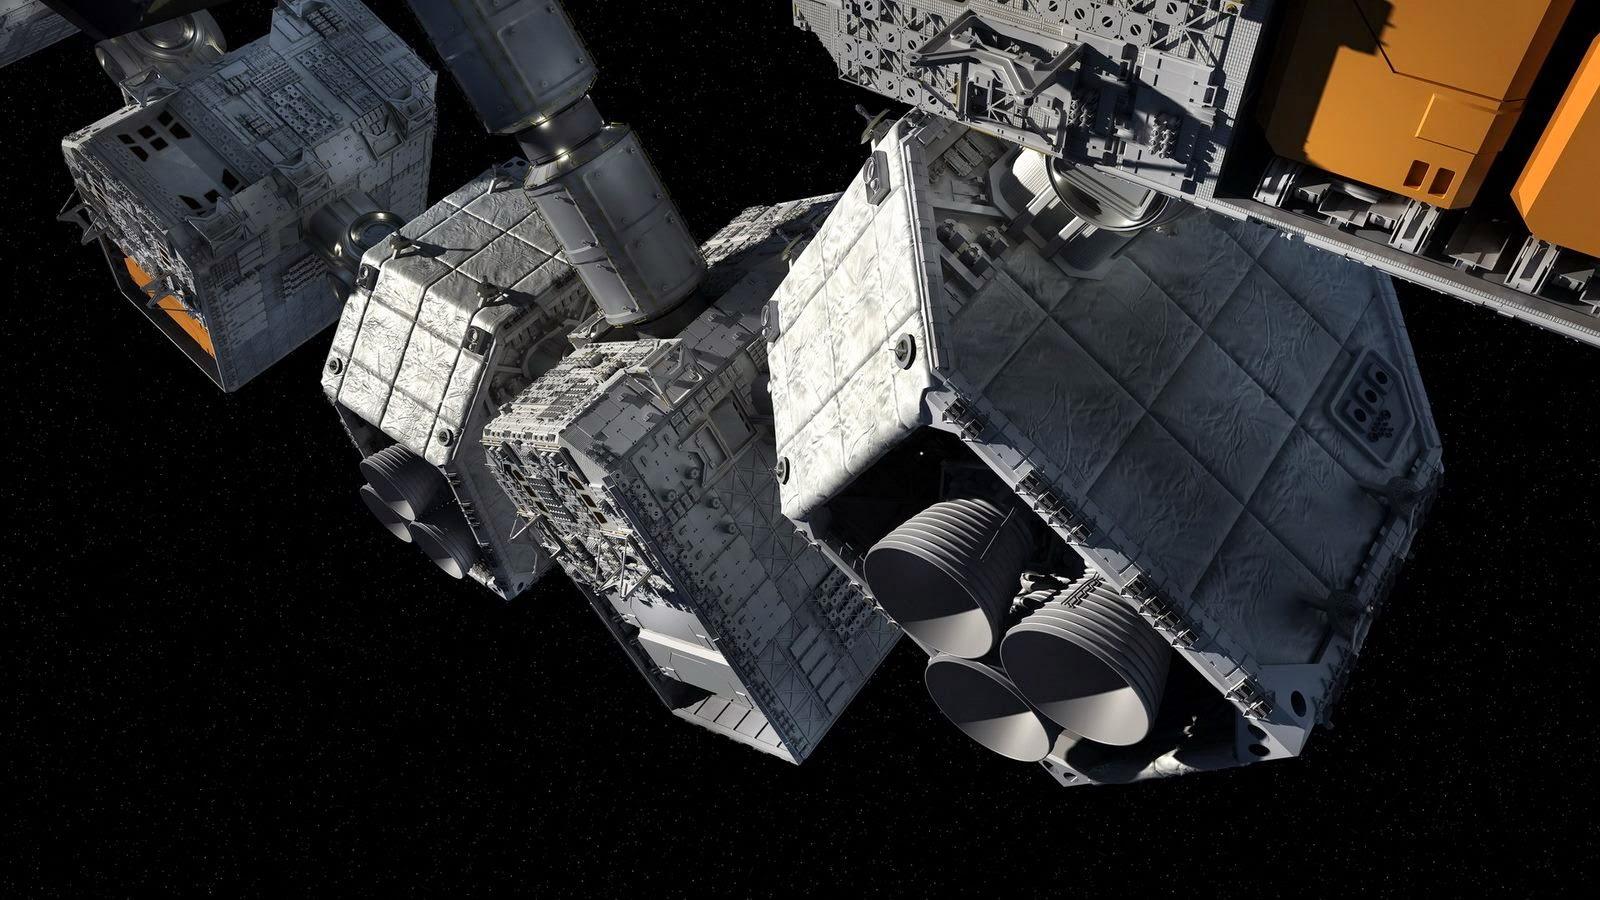 Interstellar Endurance Spaceship Wallpaper free desktop  - interstellar endurance spaceship wallpapers